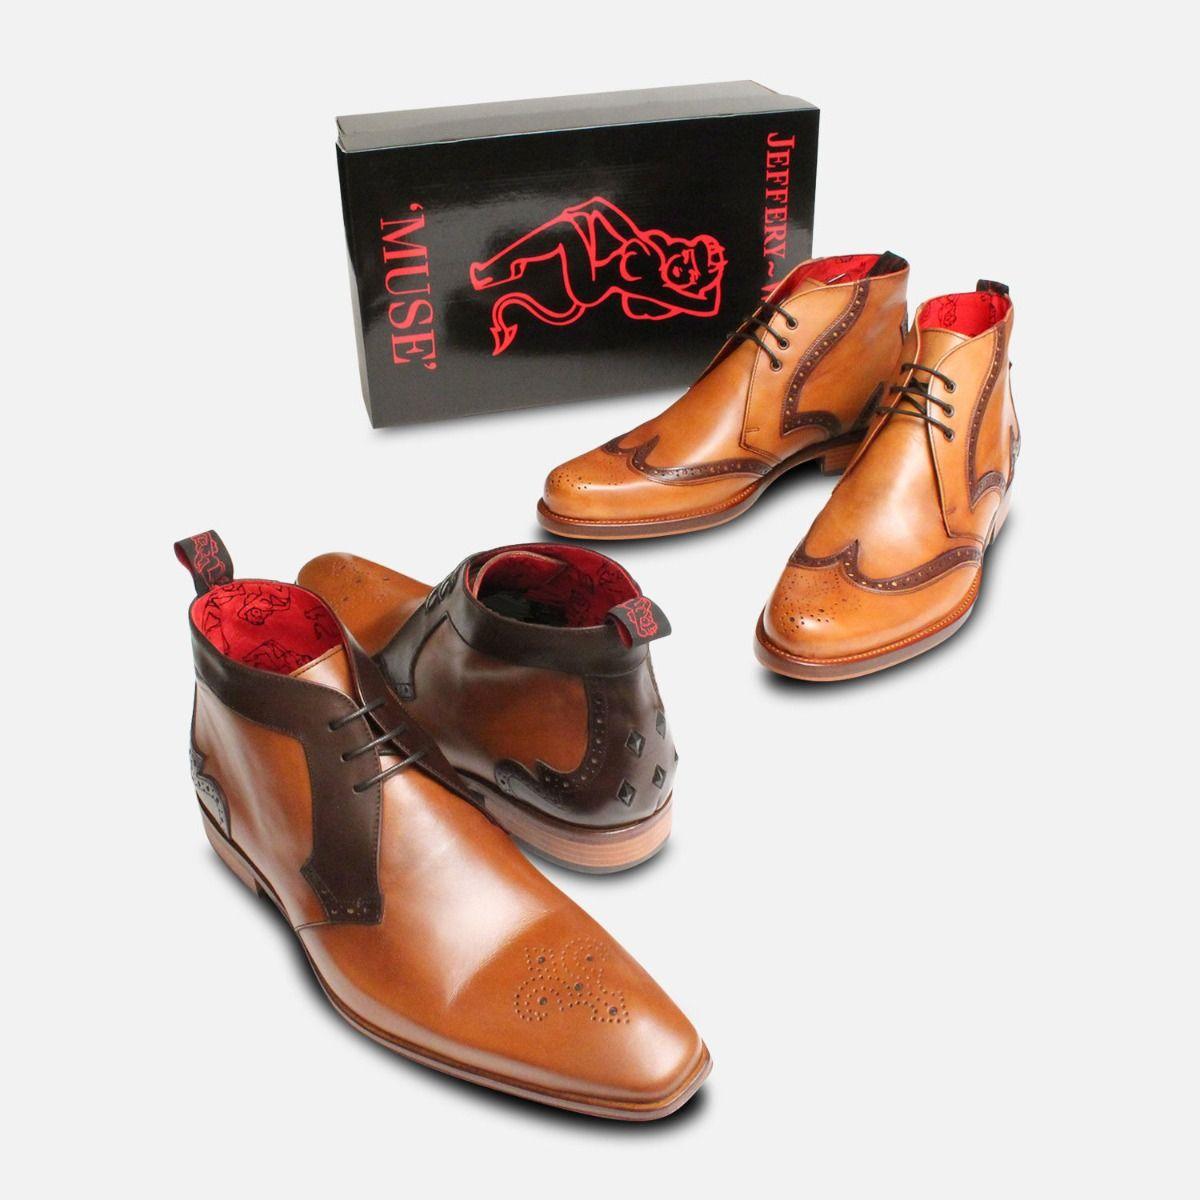 Jeffery West Round Toe Brogue Chukka Boots for Men